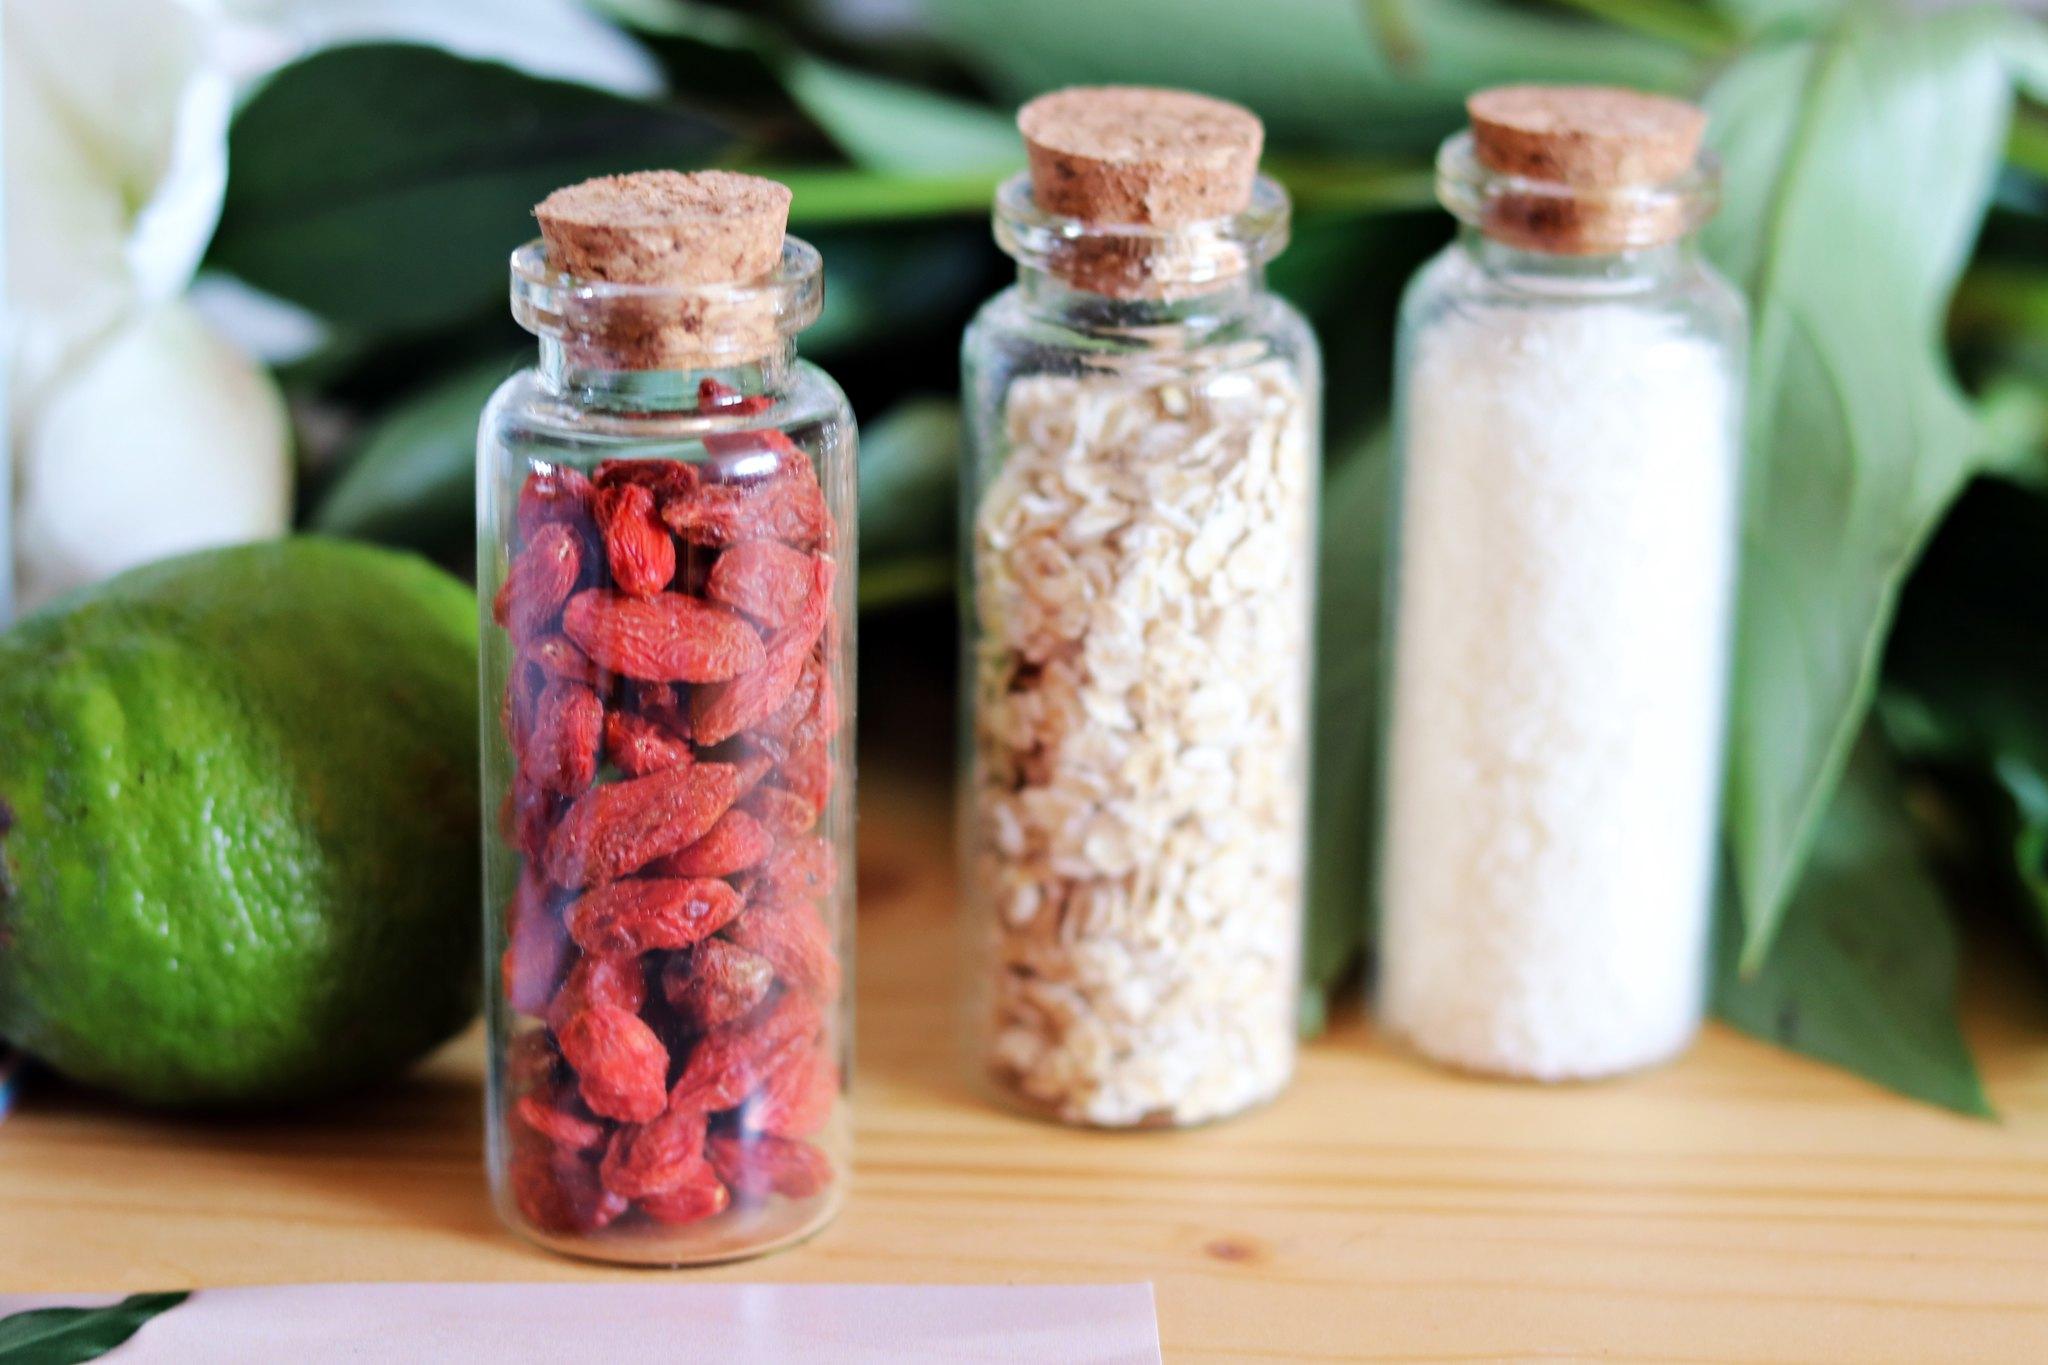 Oriflame recipiente ingrediente